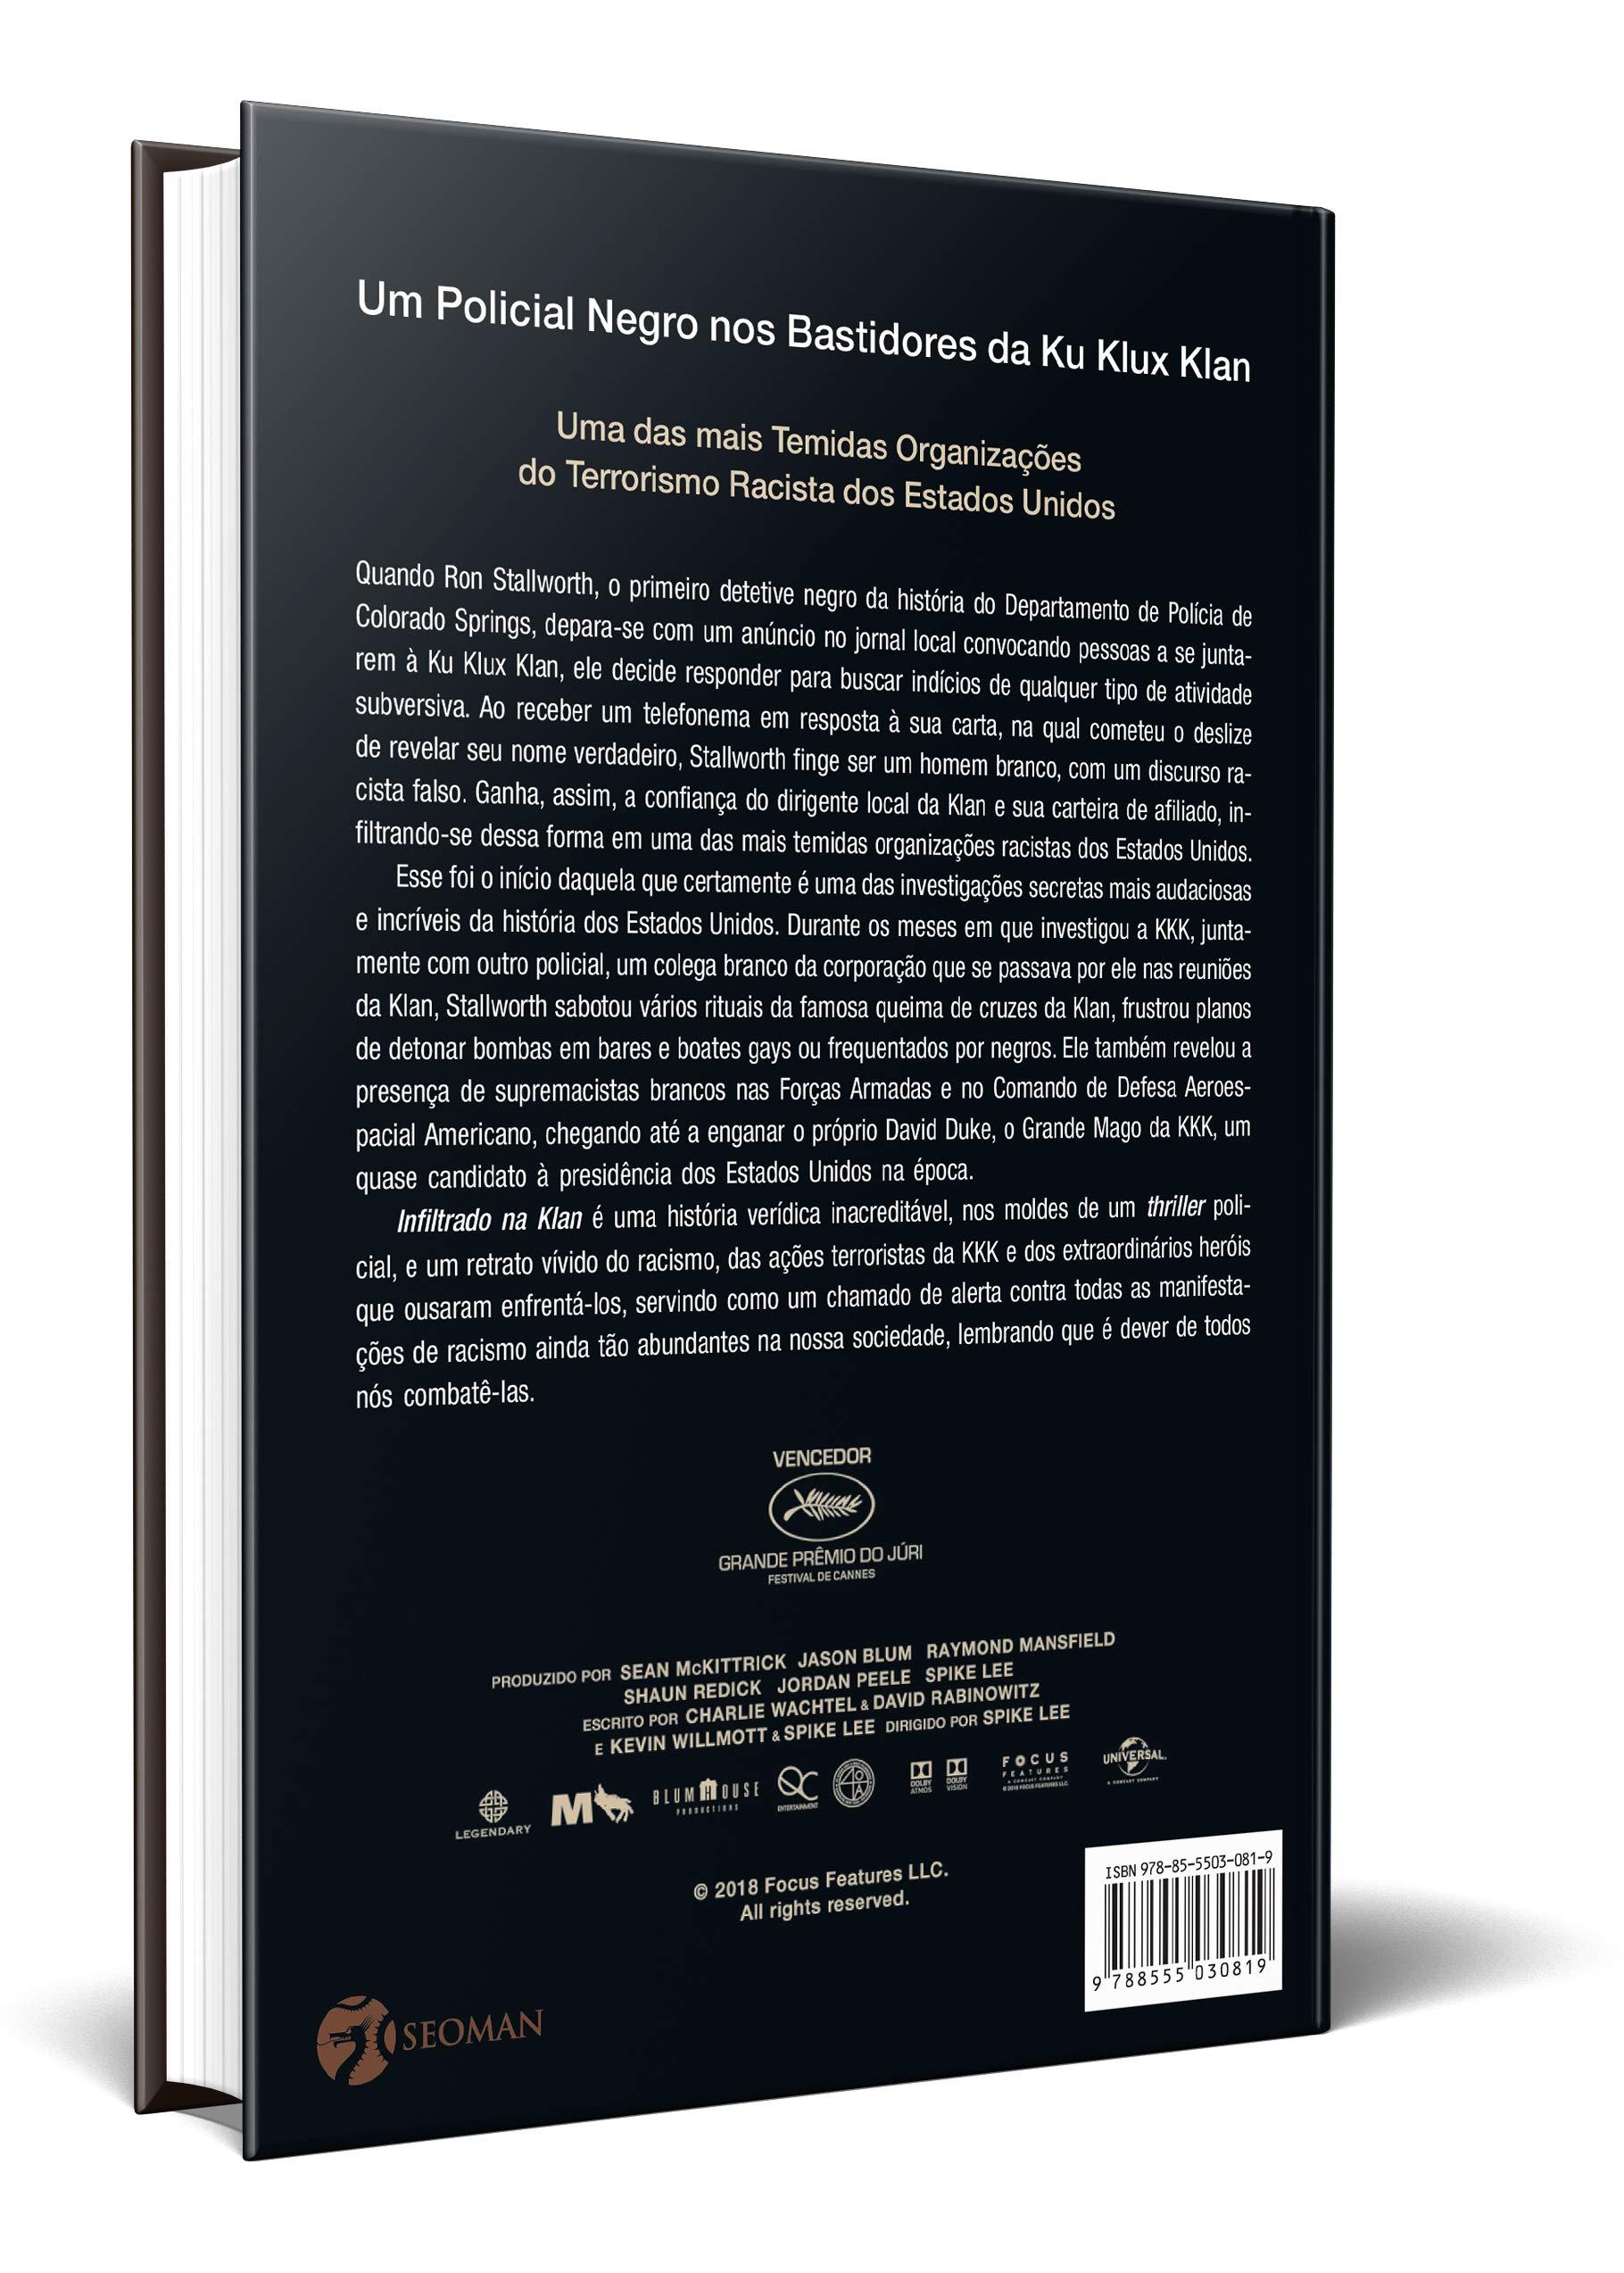 Infiltrado na Klan: Amazon.es: Ron Stallworth: Libros